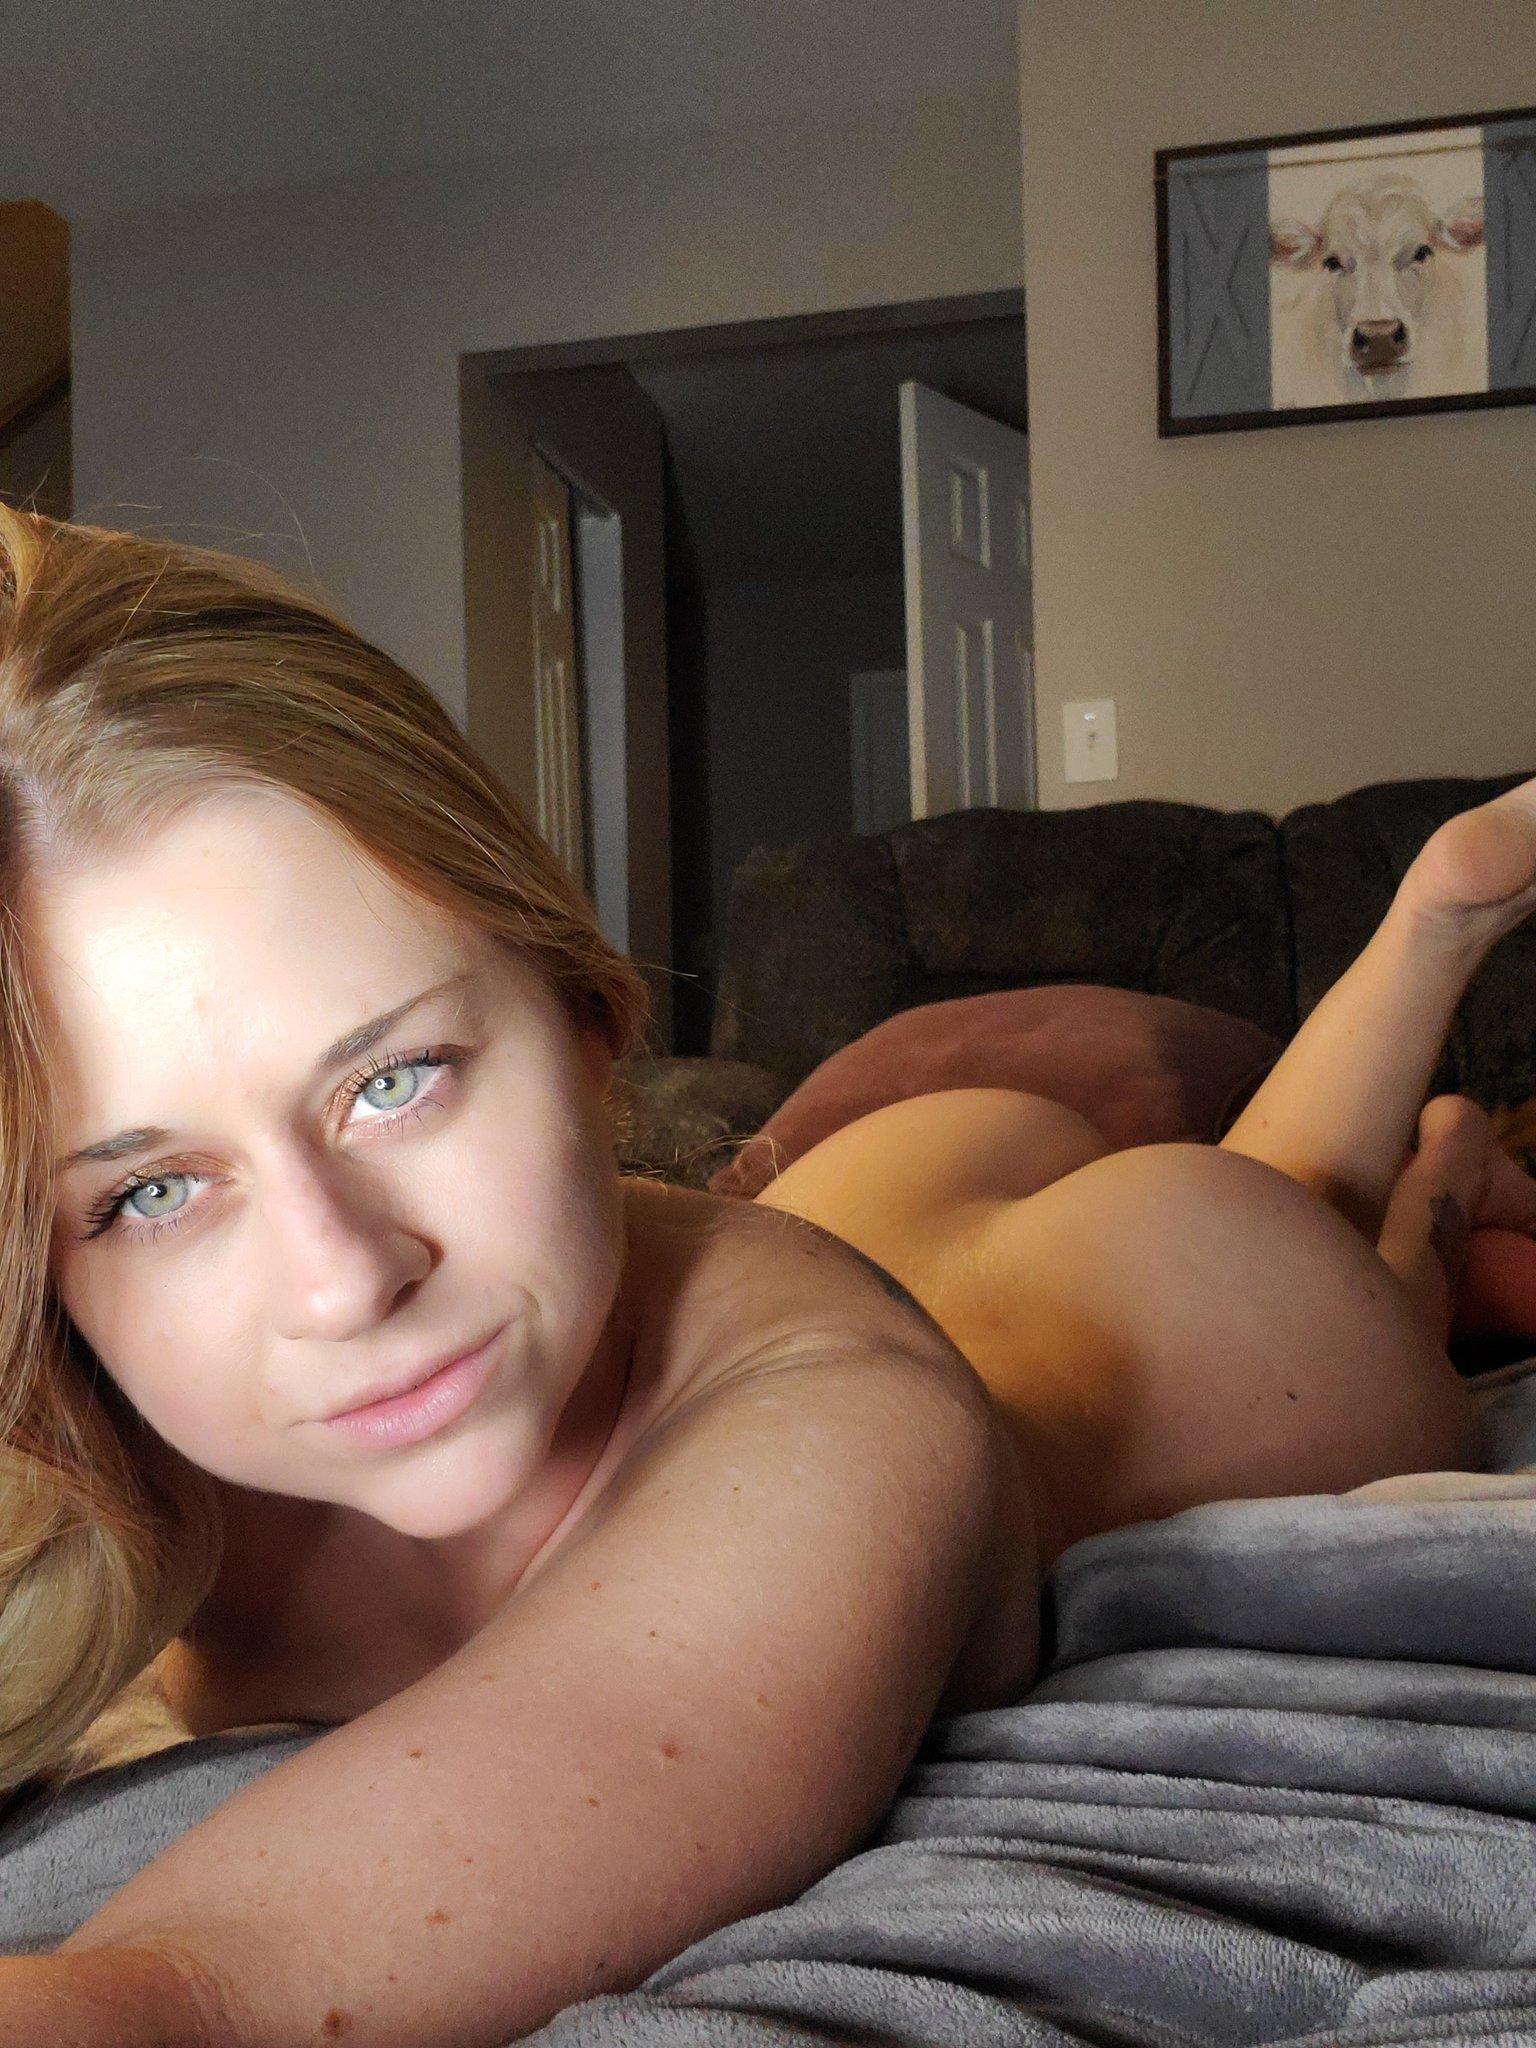 Lindsey Bubblgummbabe Sex Tape & Nude Leaked! 0023